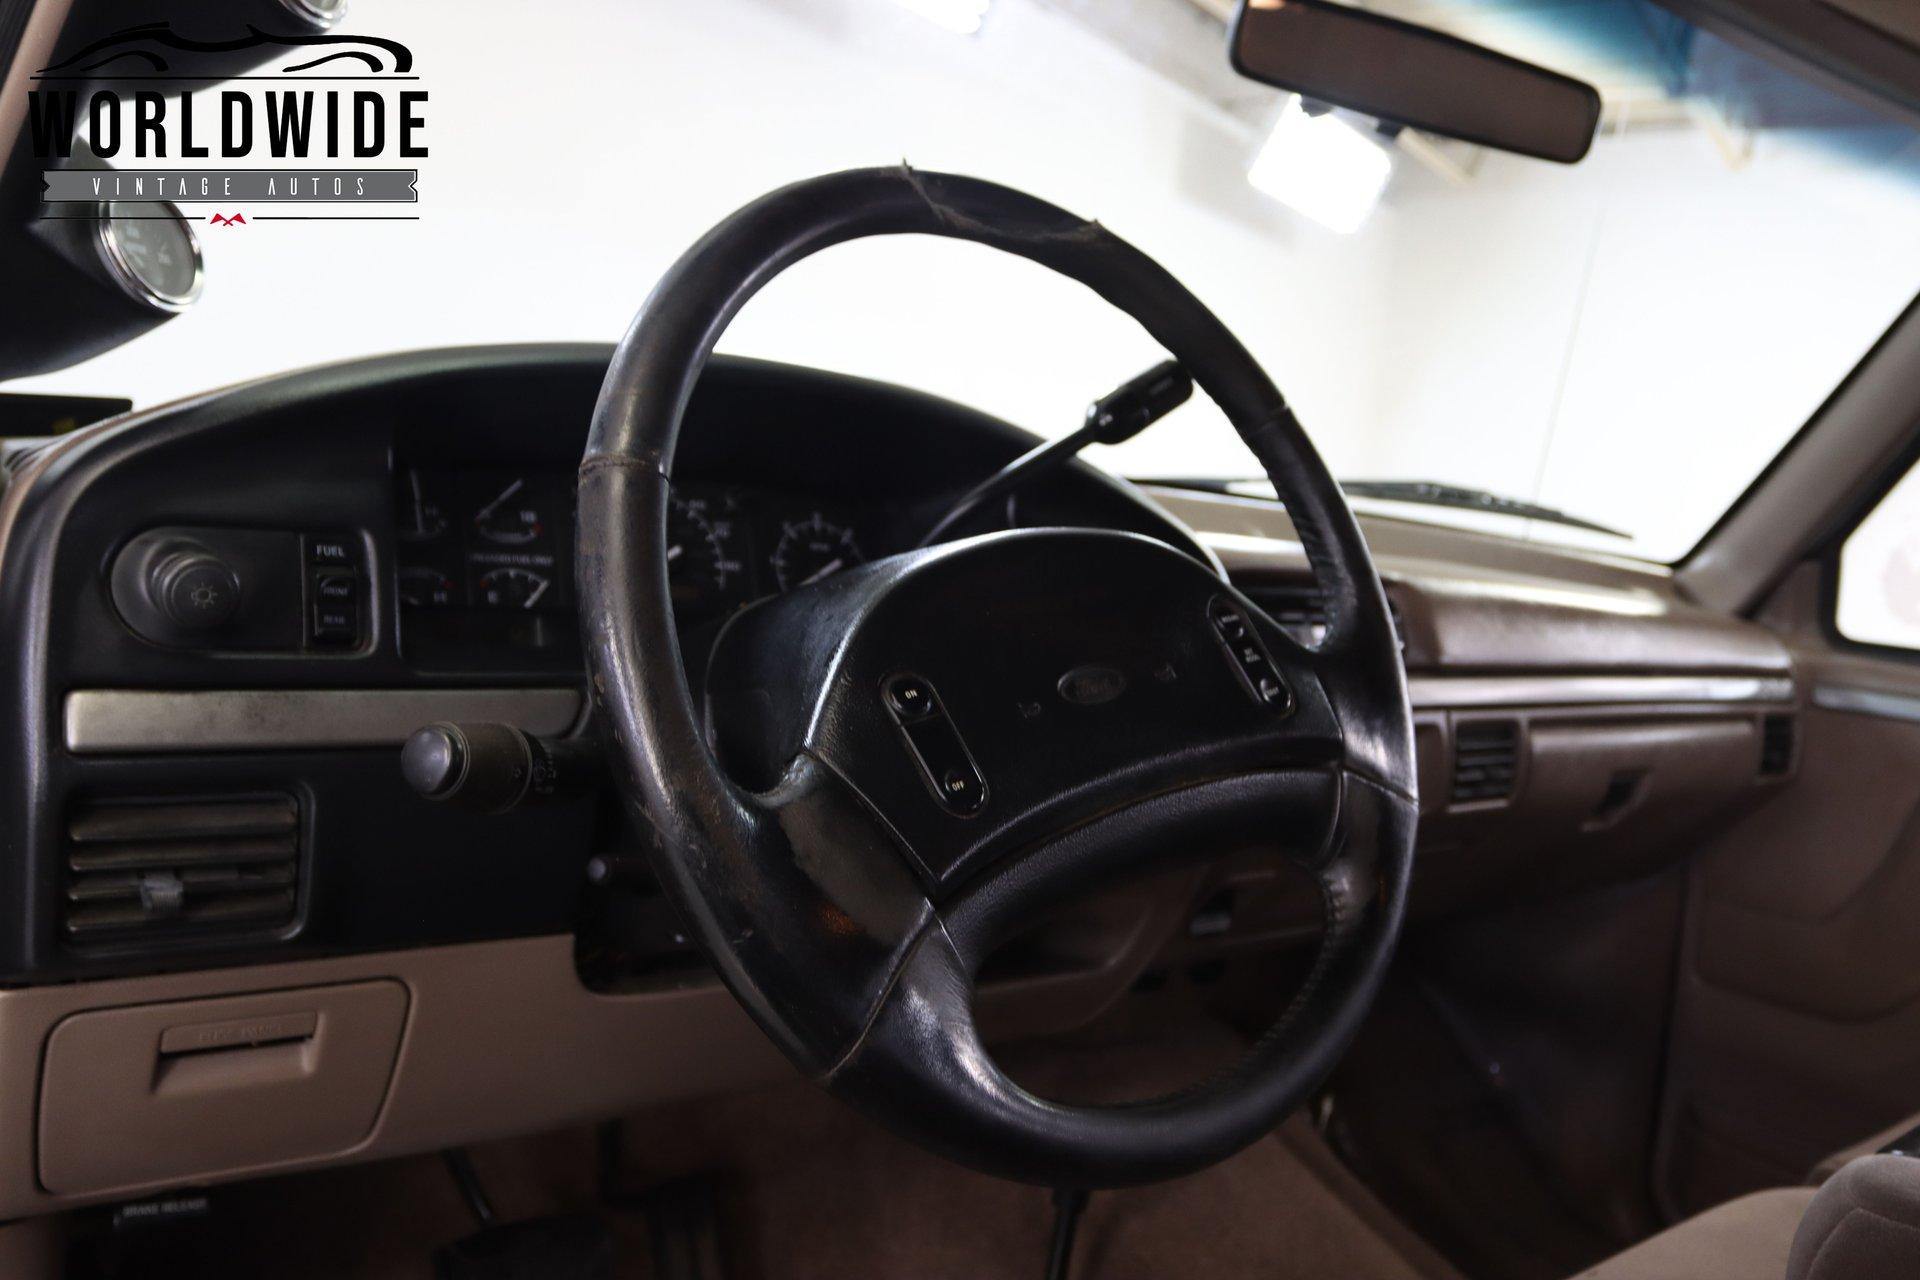 1995 Ford F-350 Crew Cab